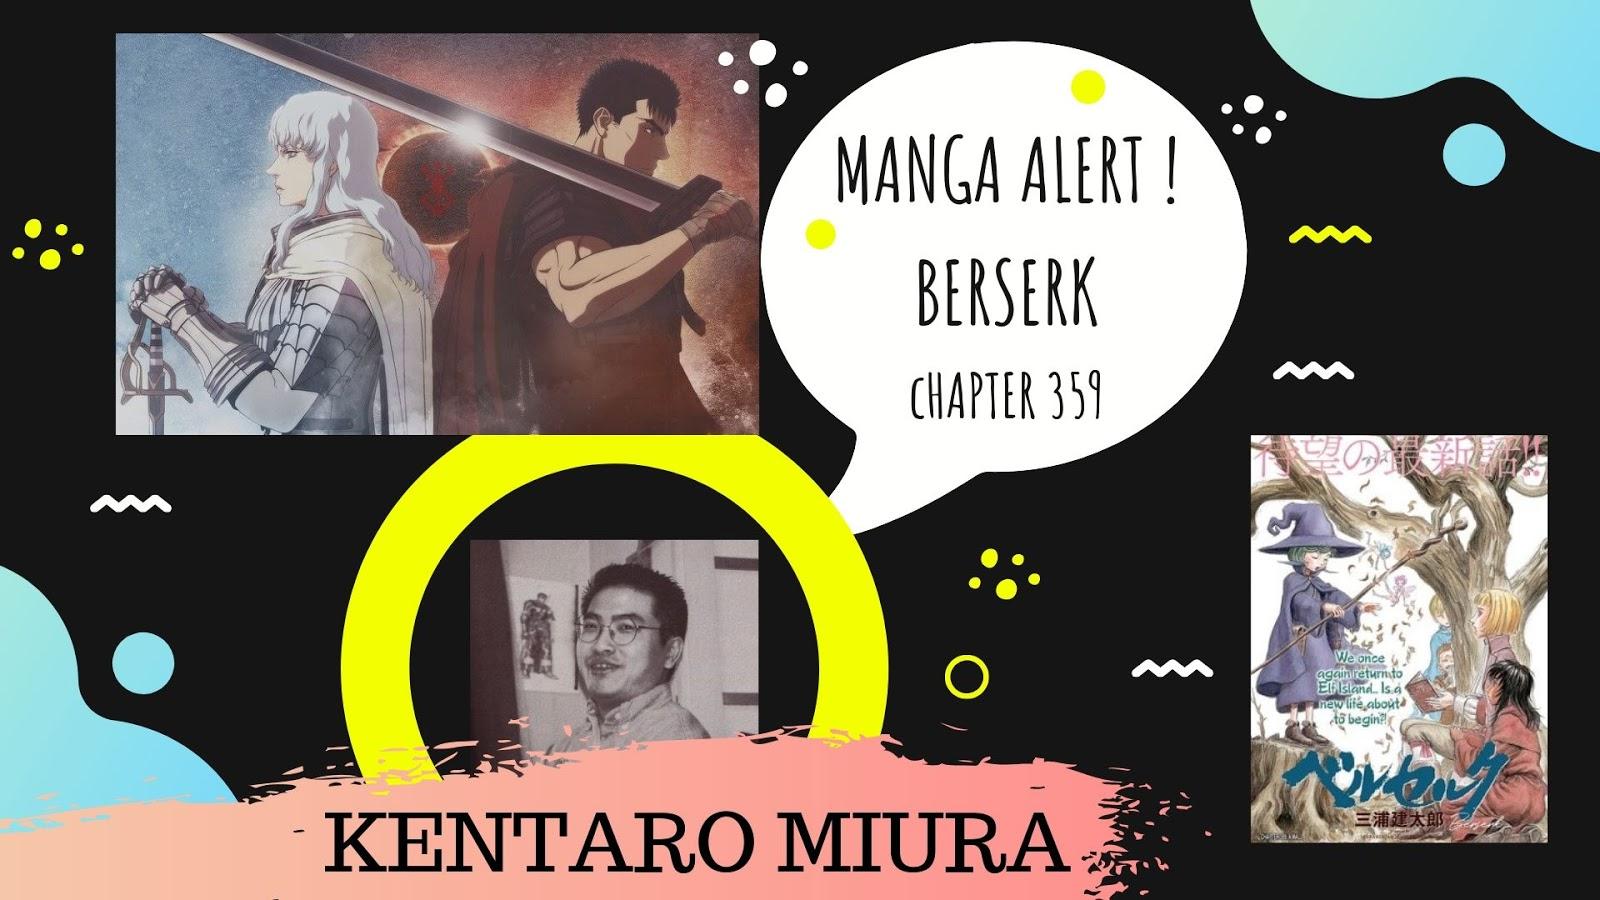 MANGA ALERT ! BERSERK Chapter 359 - OtakuPlay PH: Anime